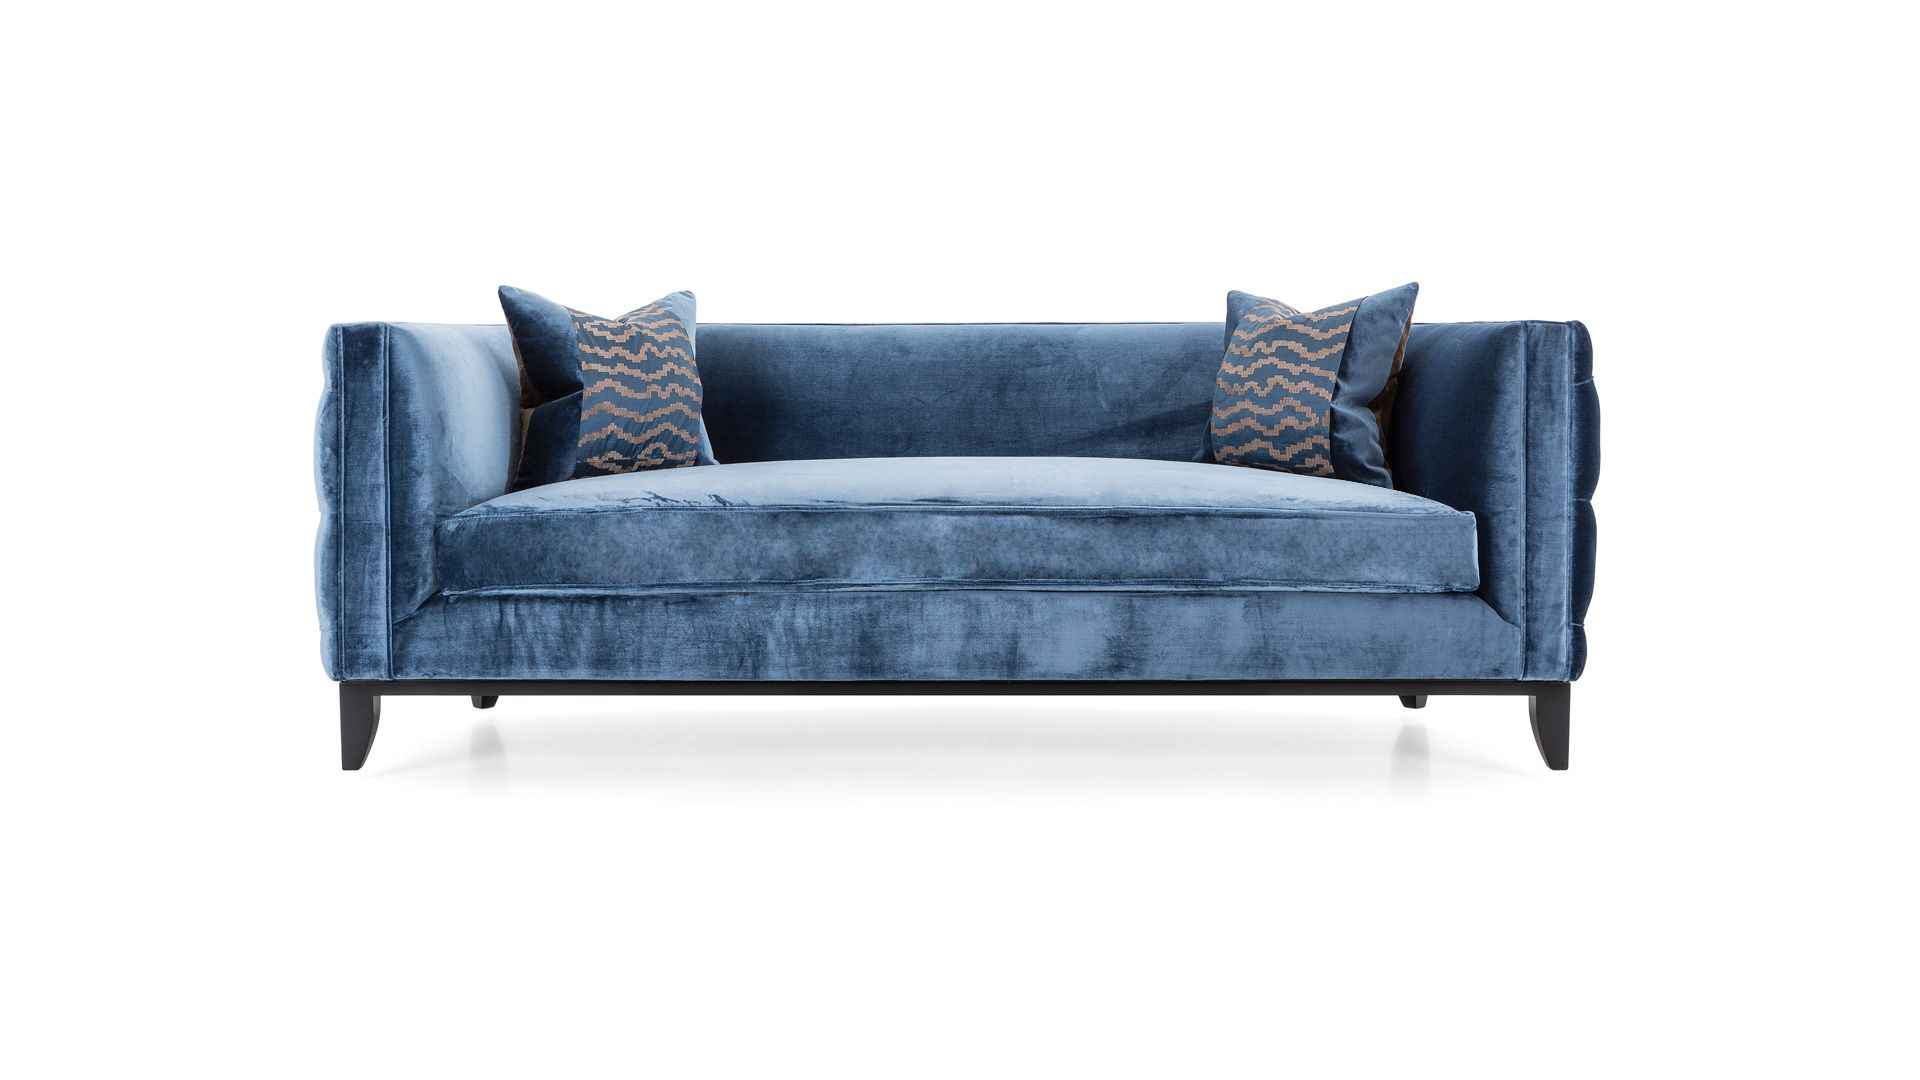 cashmere bespoke sofa london dw多位沙发 直线型 pinterest